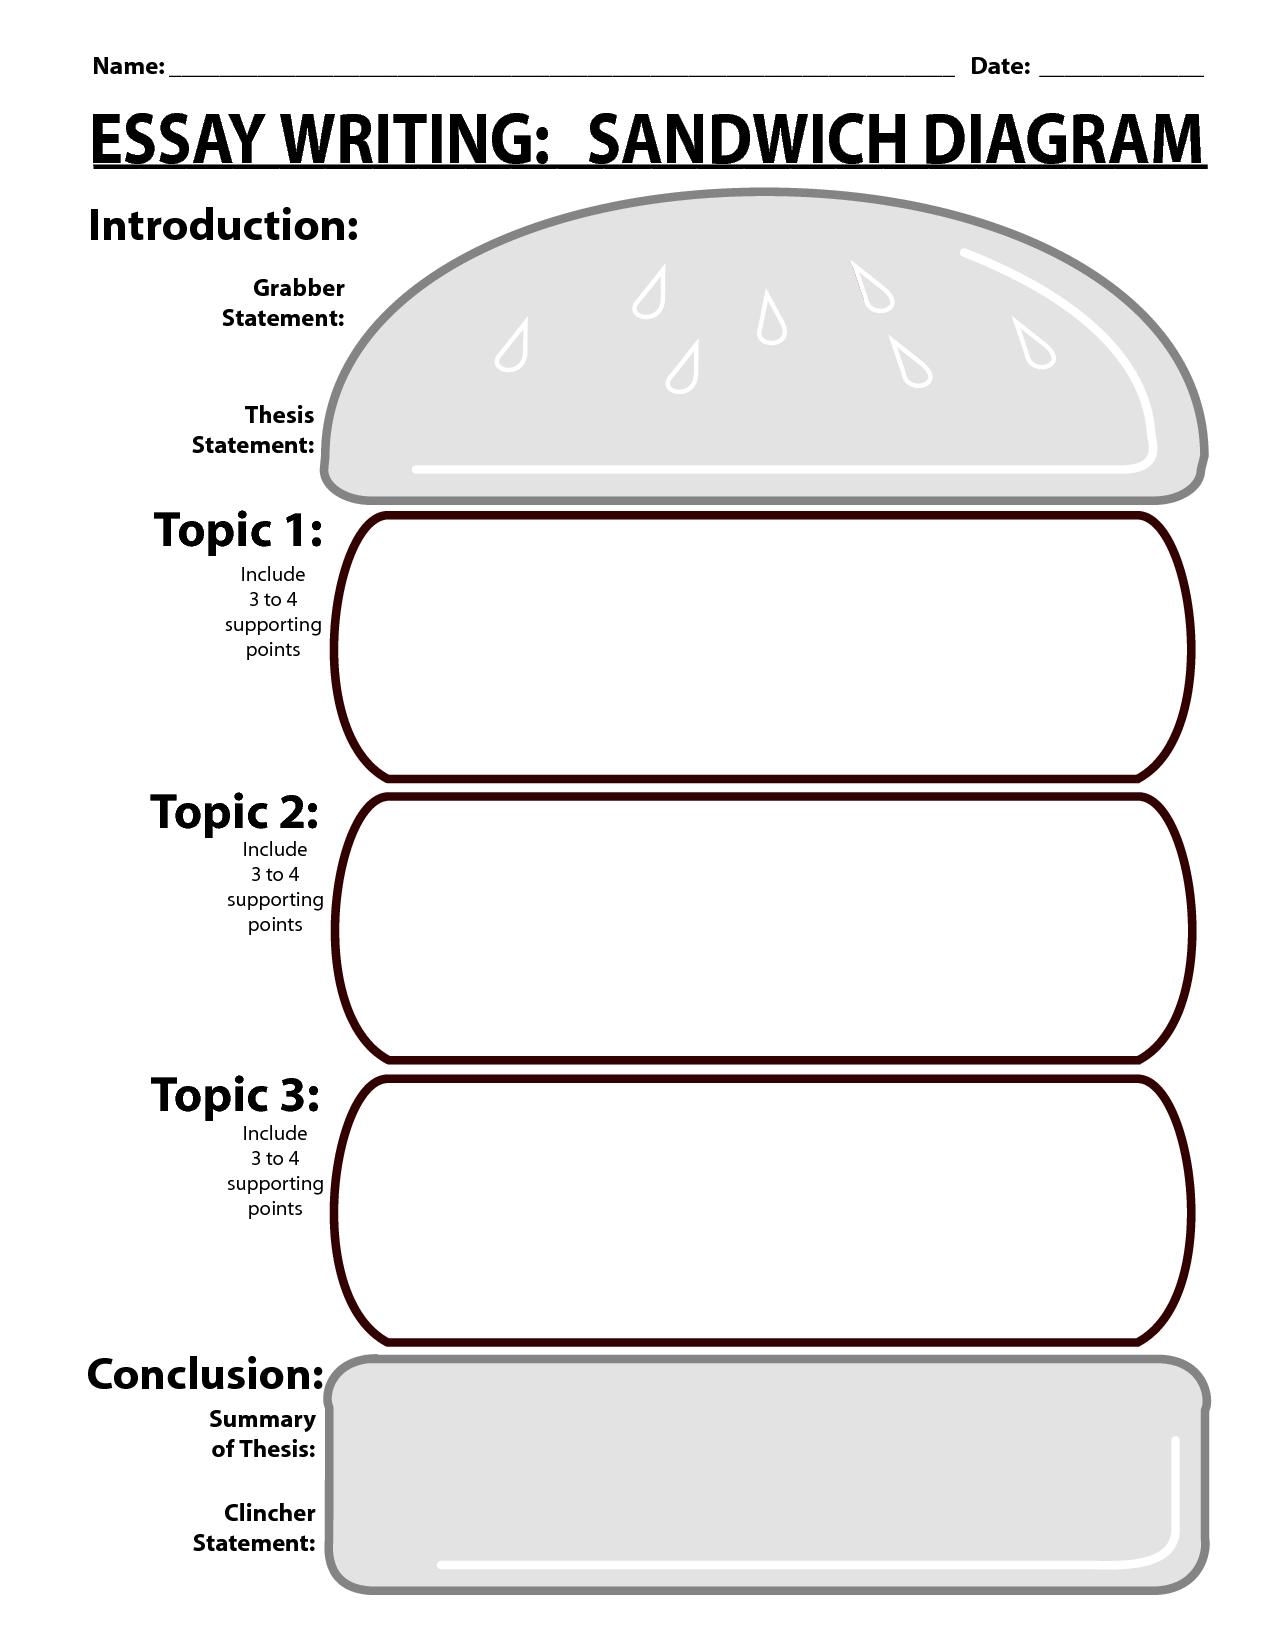 Essay Writing Sandwich Diagram 1983 Porsche 944 Radio Wiring Pdf | - Download As ★teaching In ...